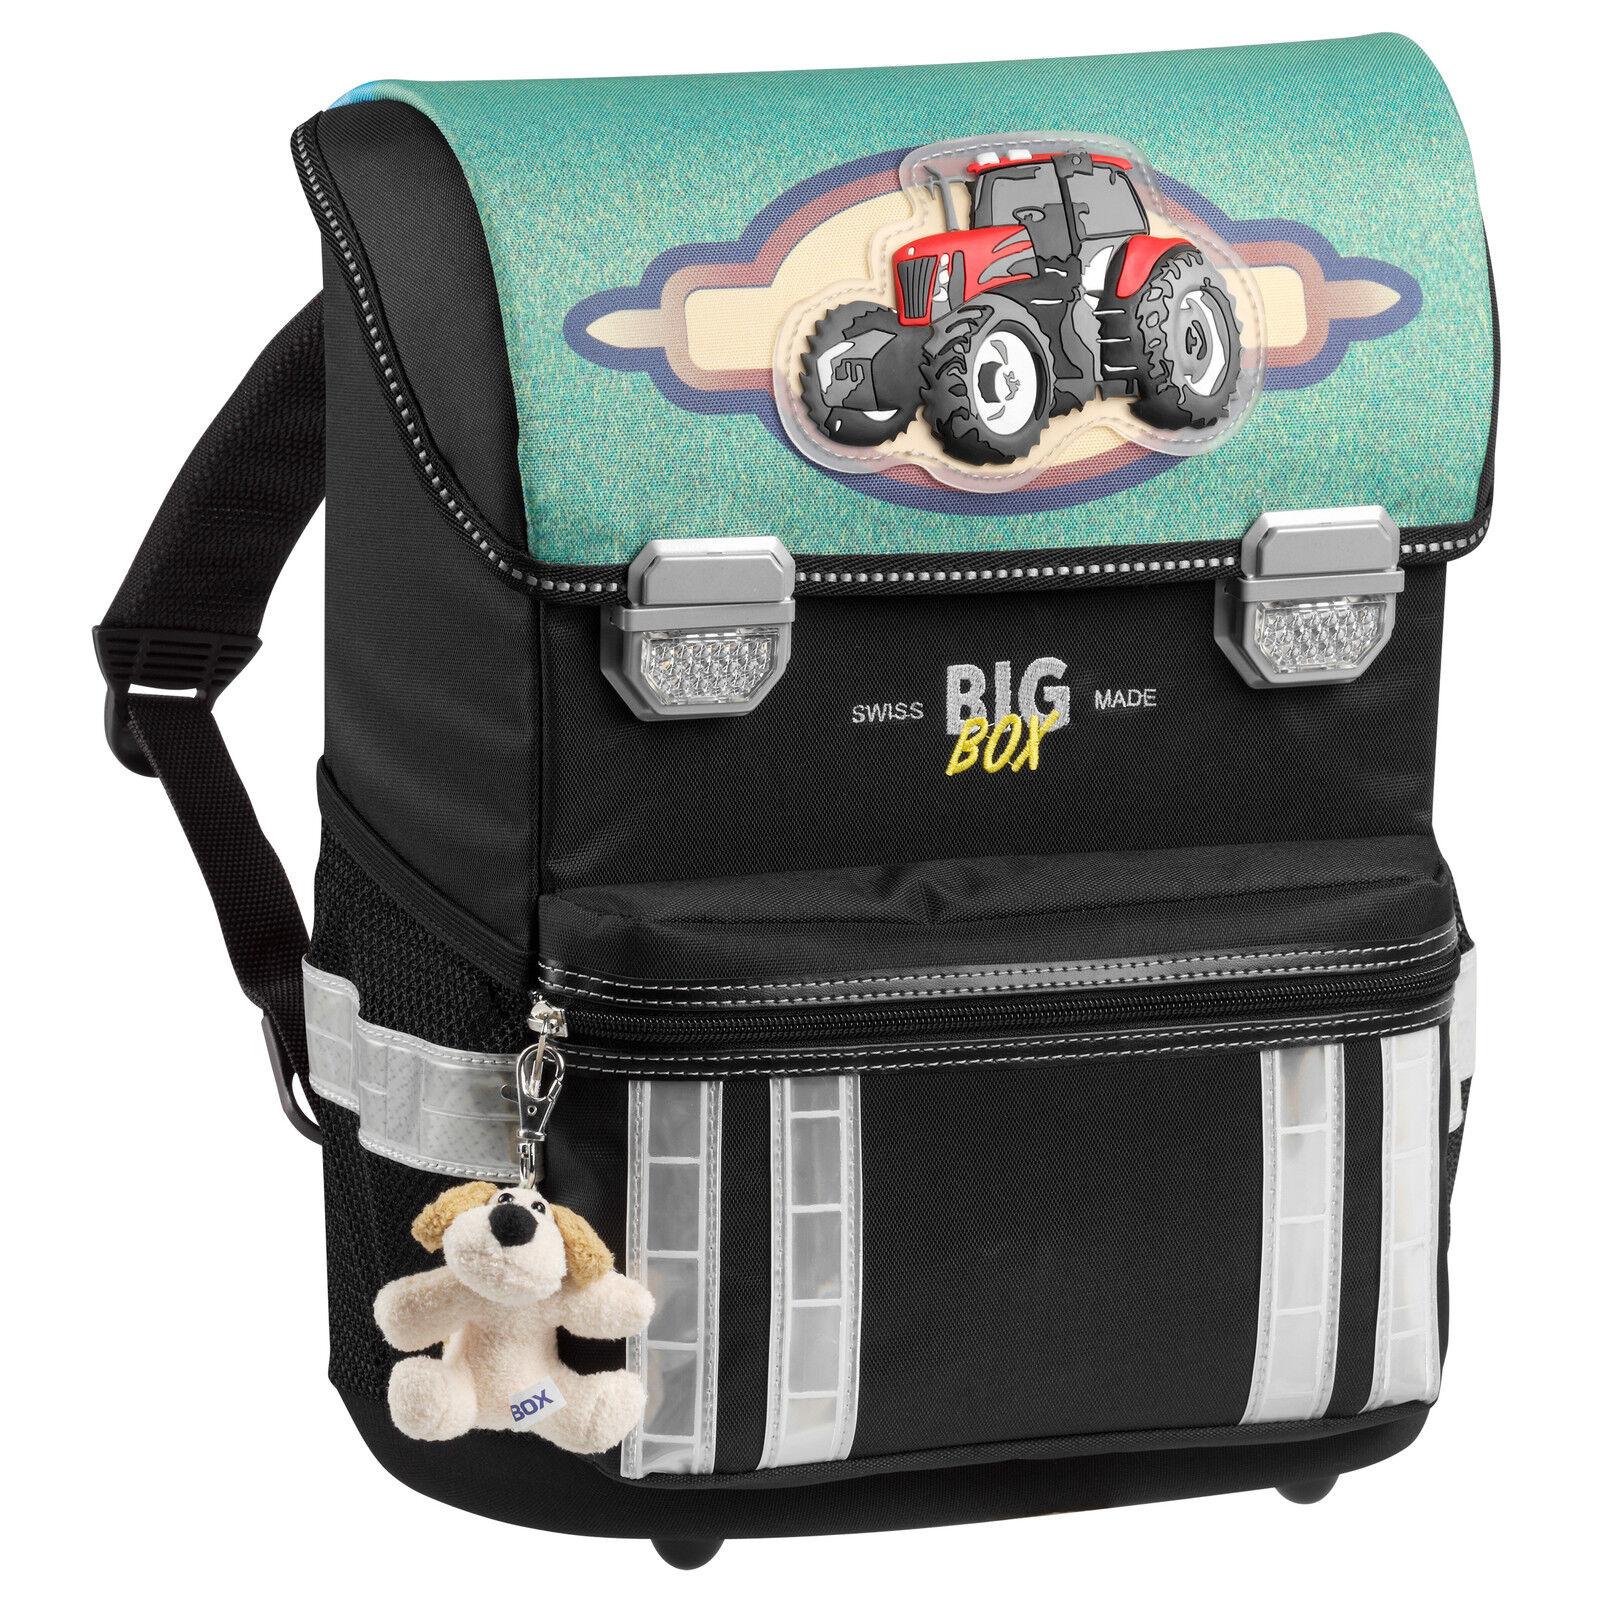 BigBox Leggero Traktor Schule Tornister Schulthek 3-D-Applikation Trekker Ranzen | Haltbarkeit  | Economy  | Billig ideal